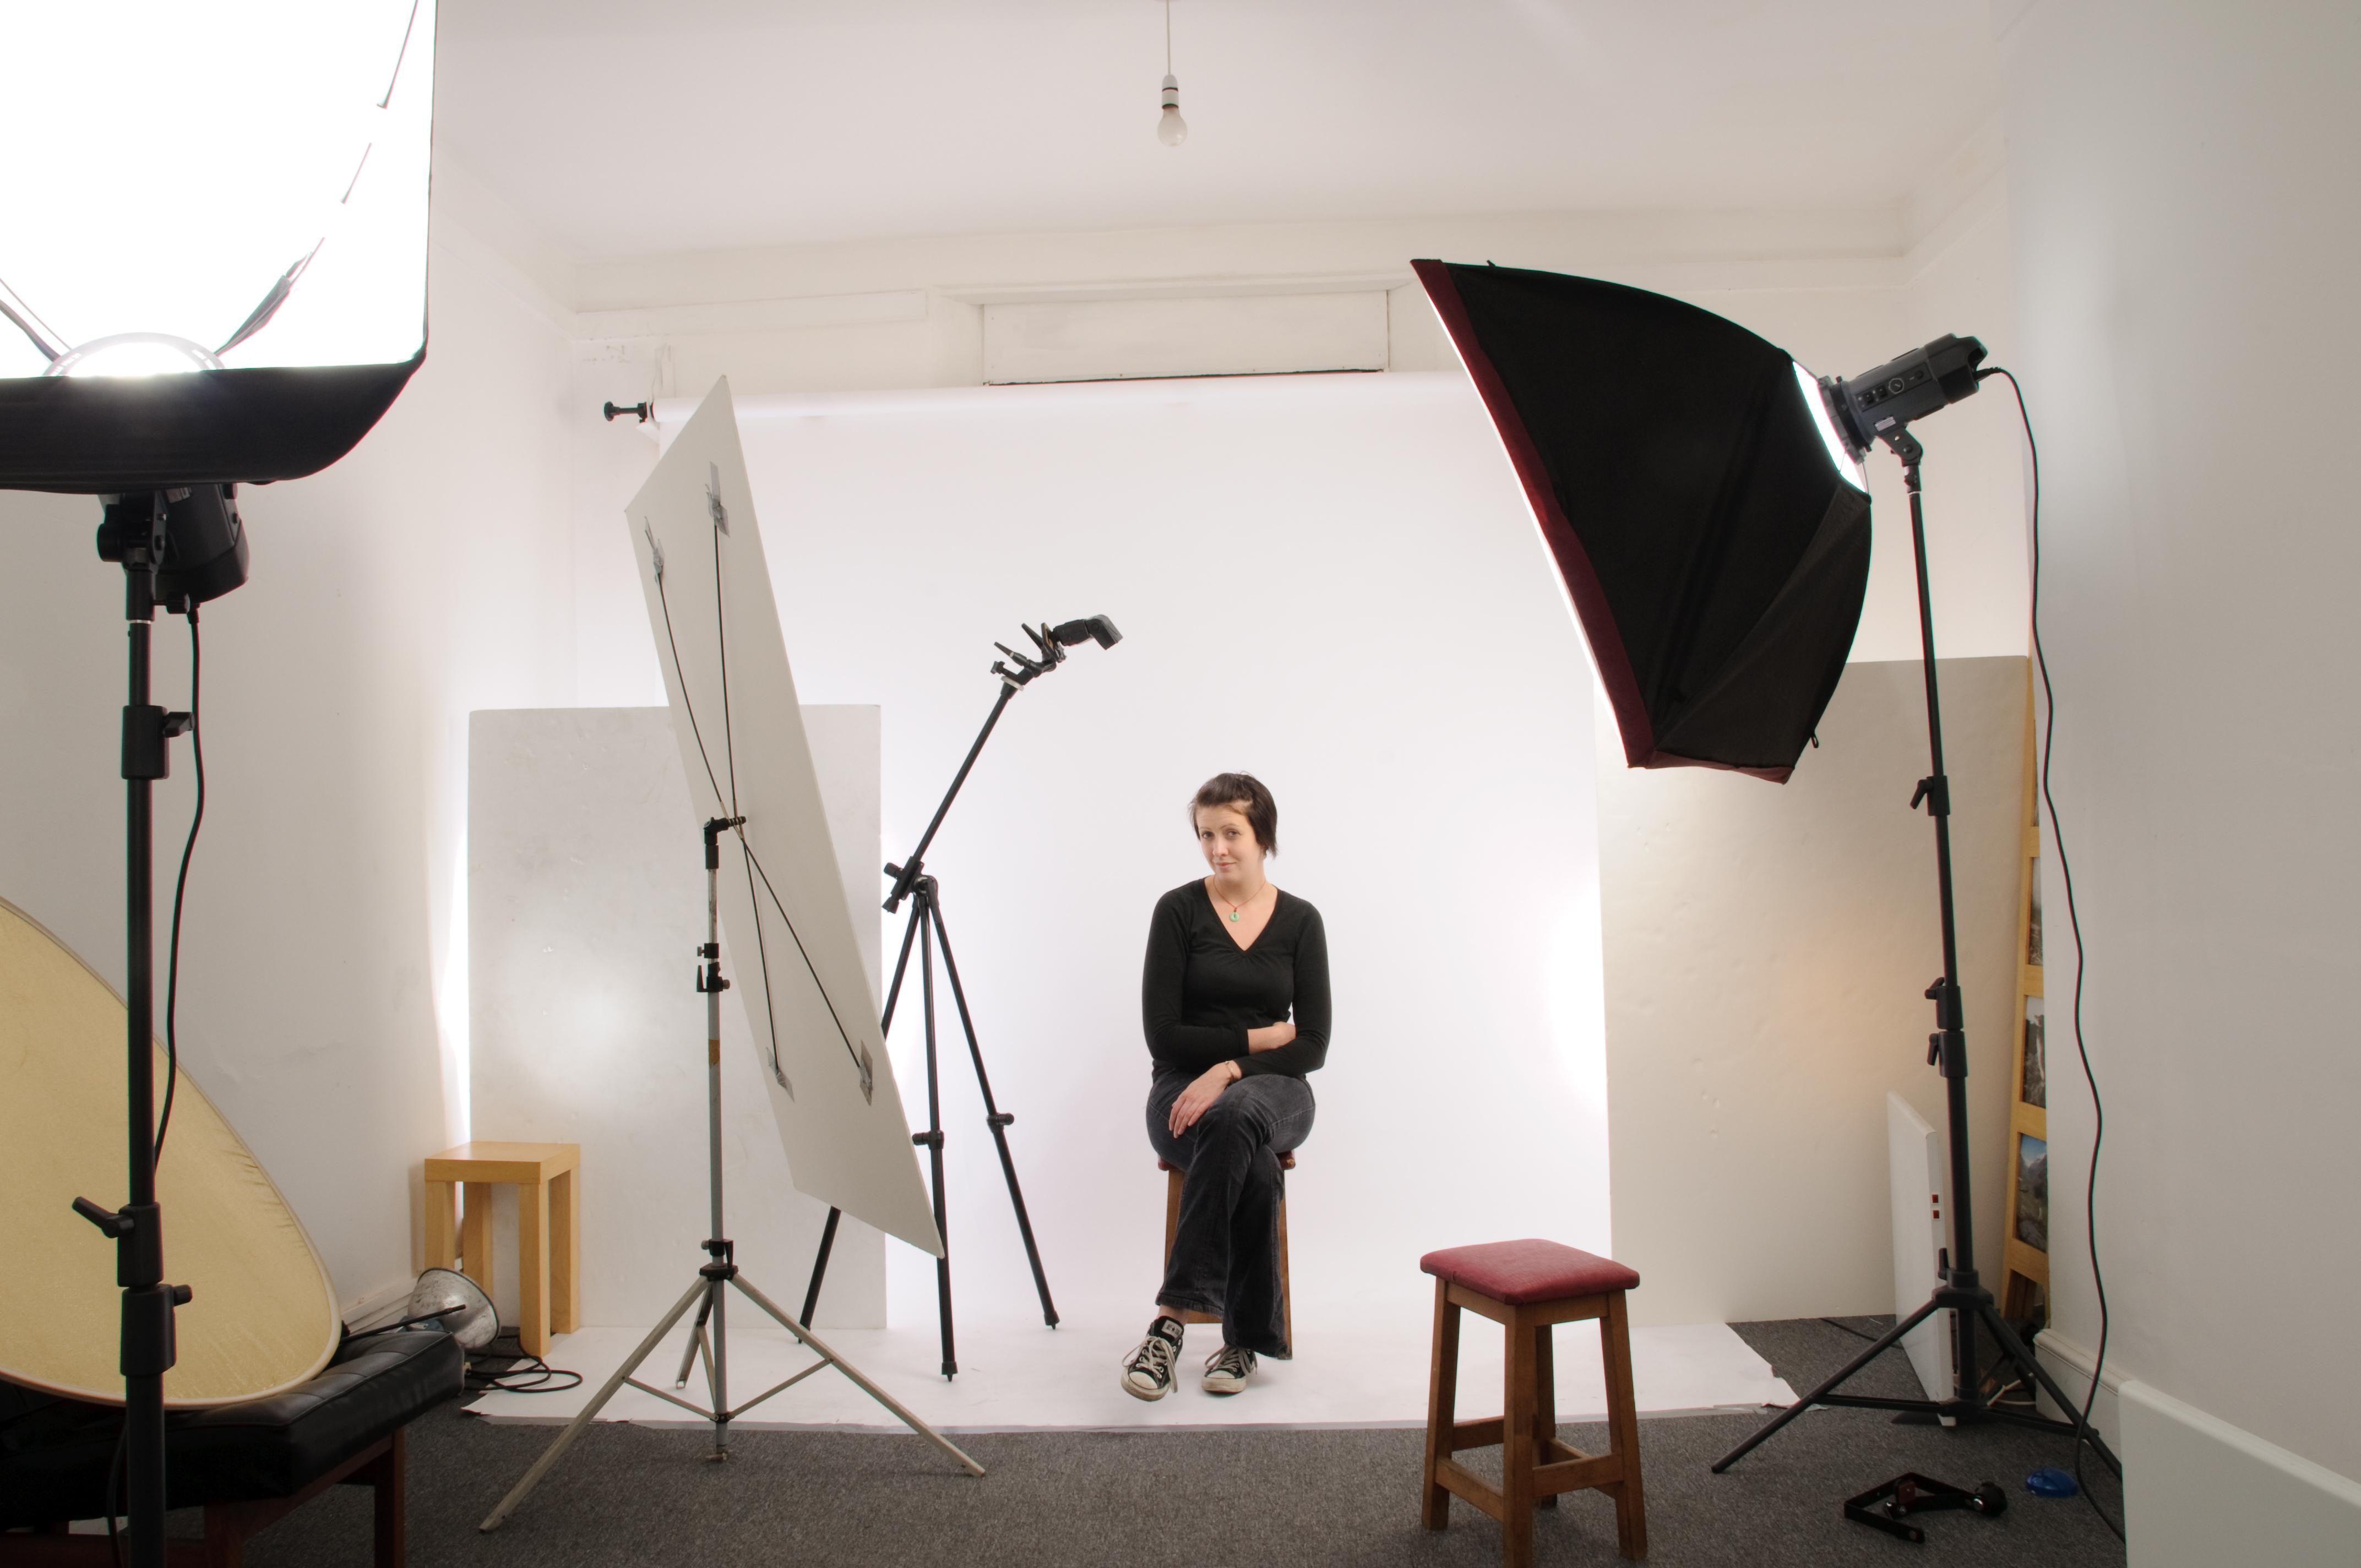 Studio Setup Shot Flickr Photo Sharing